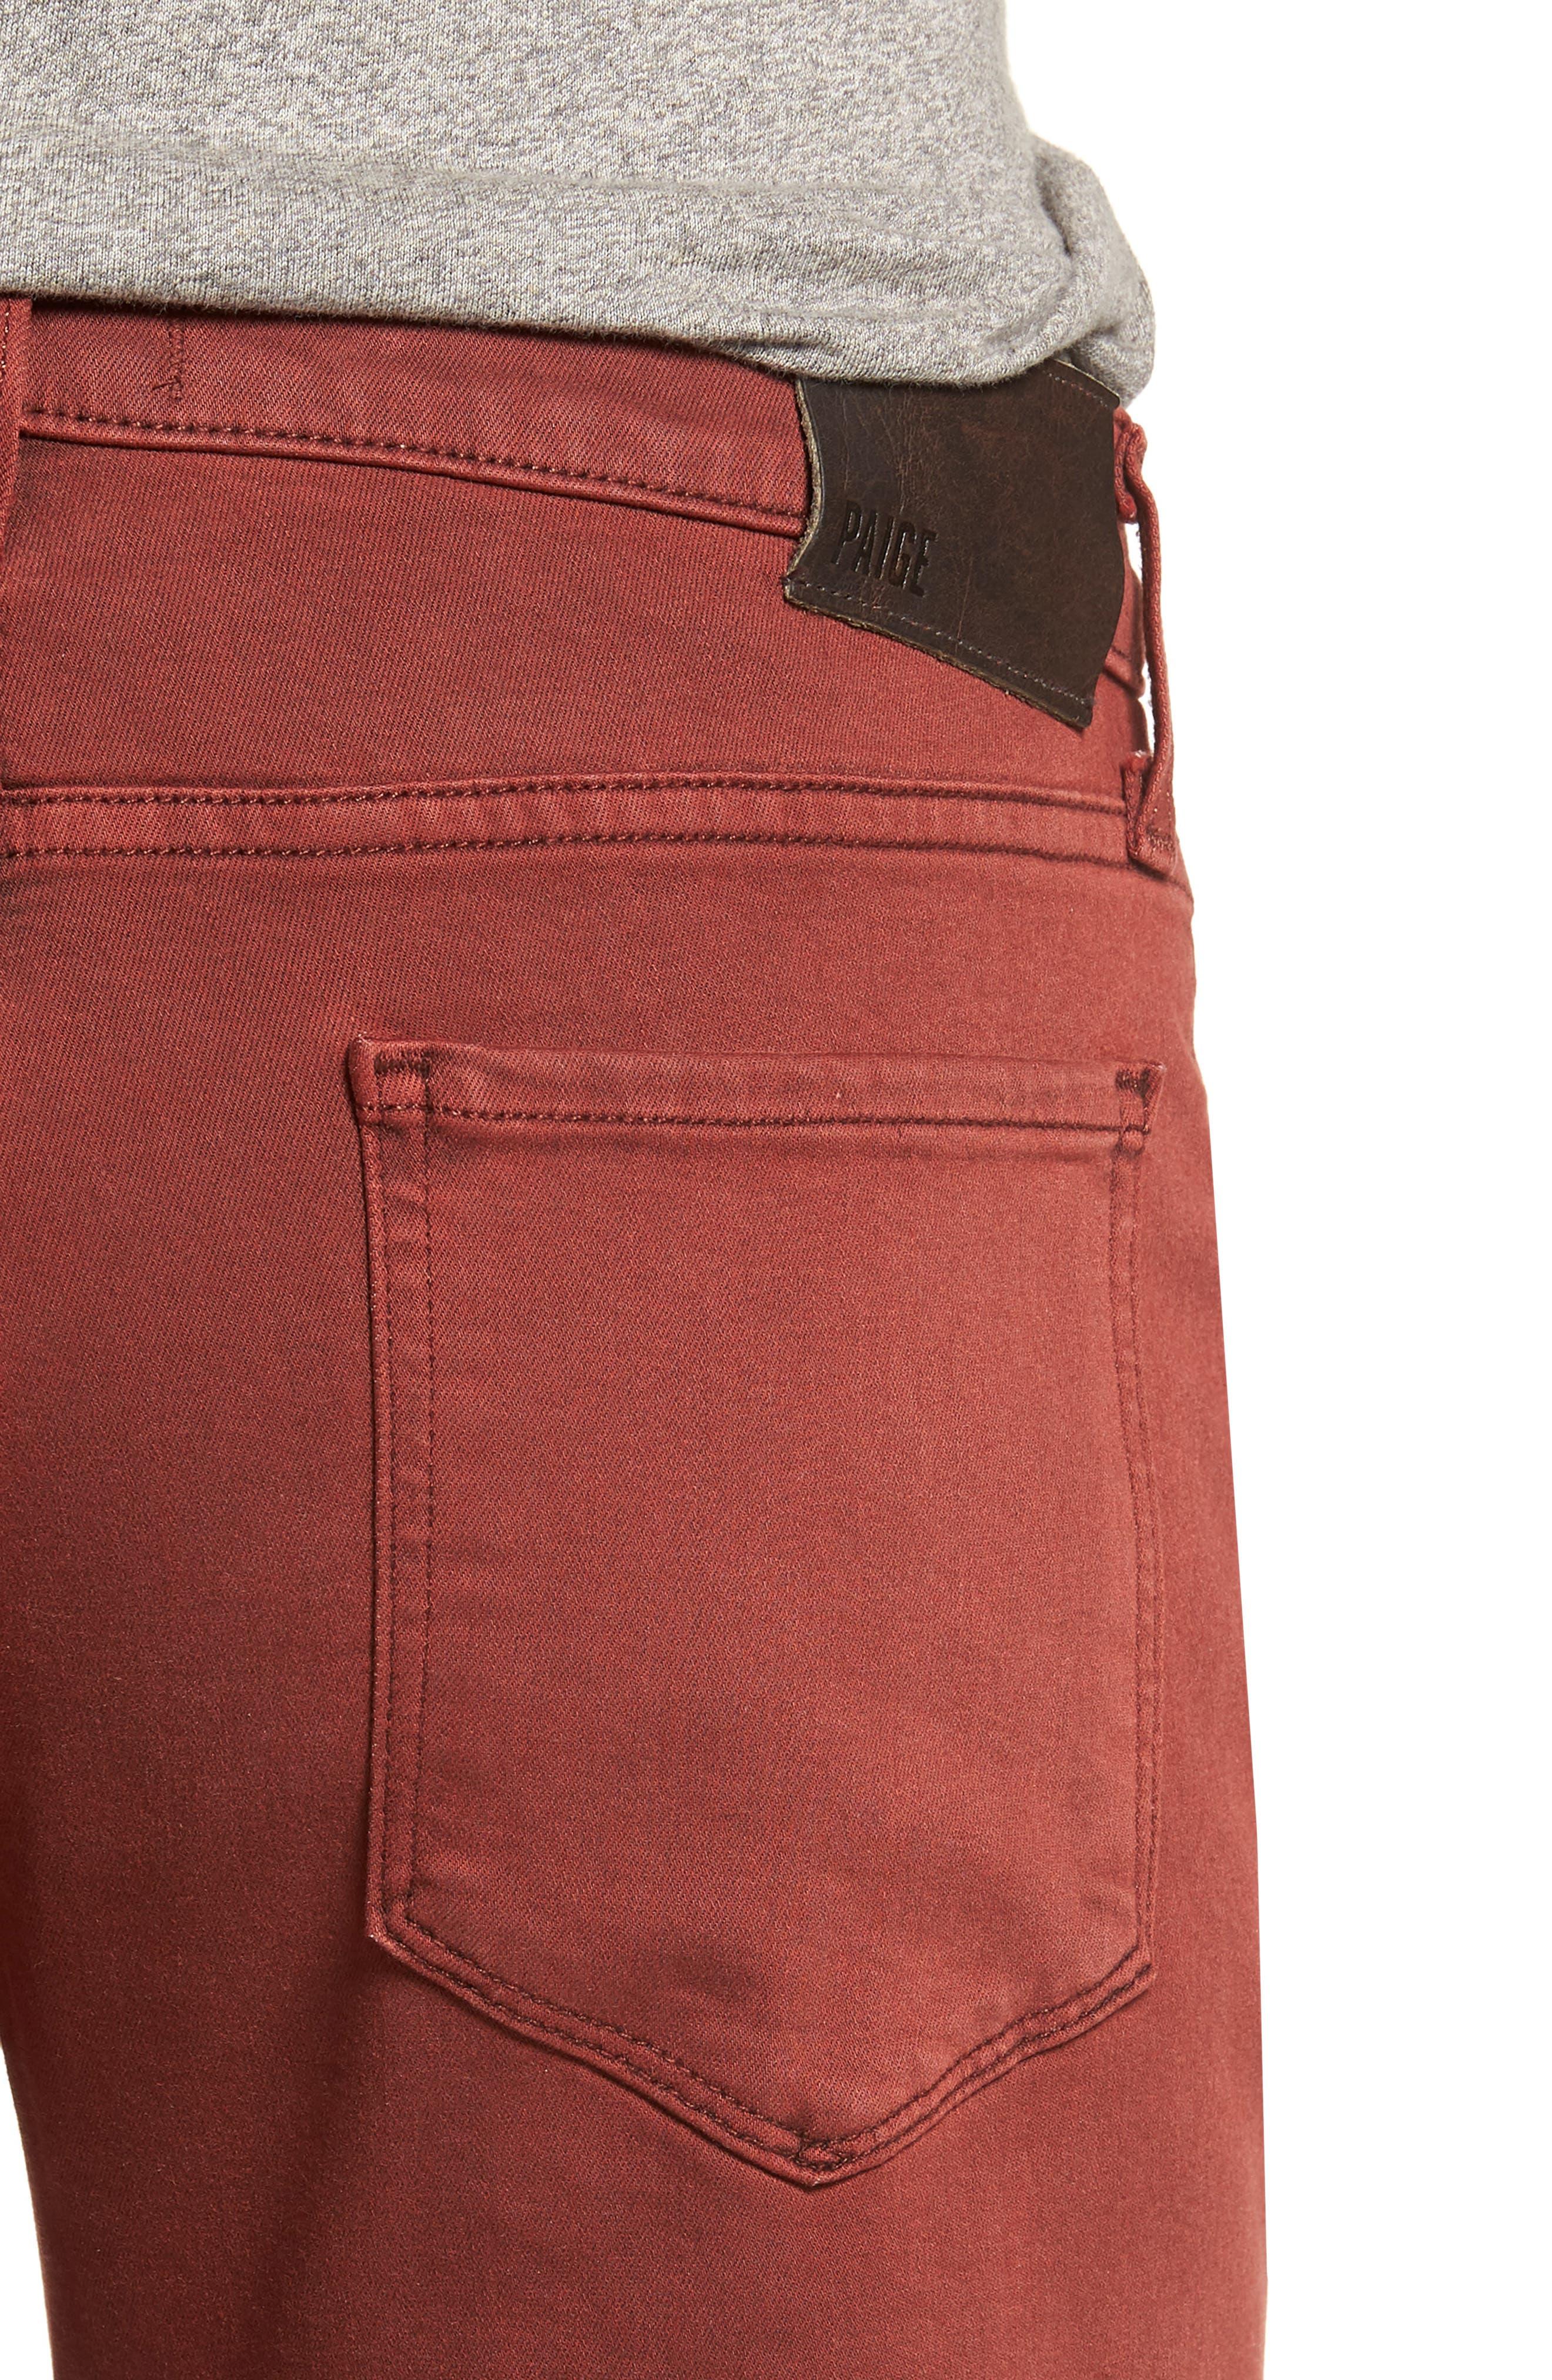 Transcend - Federal Slim Straight Leg Jeans,                             Alternate thumbnail 4, color,                             VINTAGE PERSIMMON